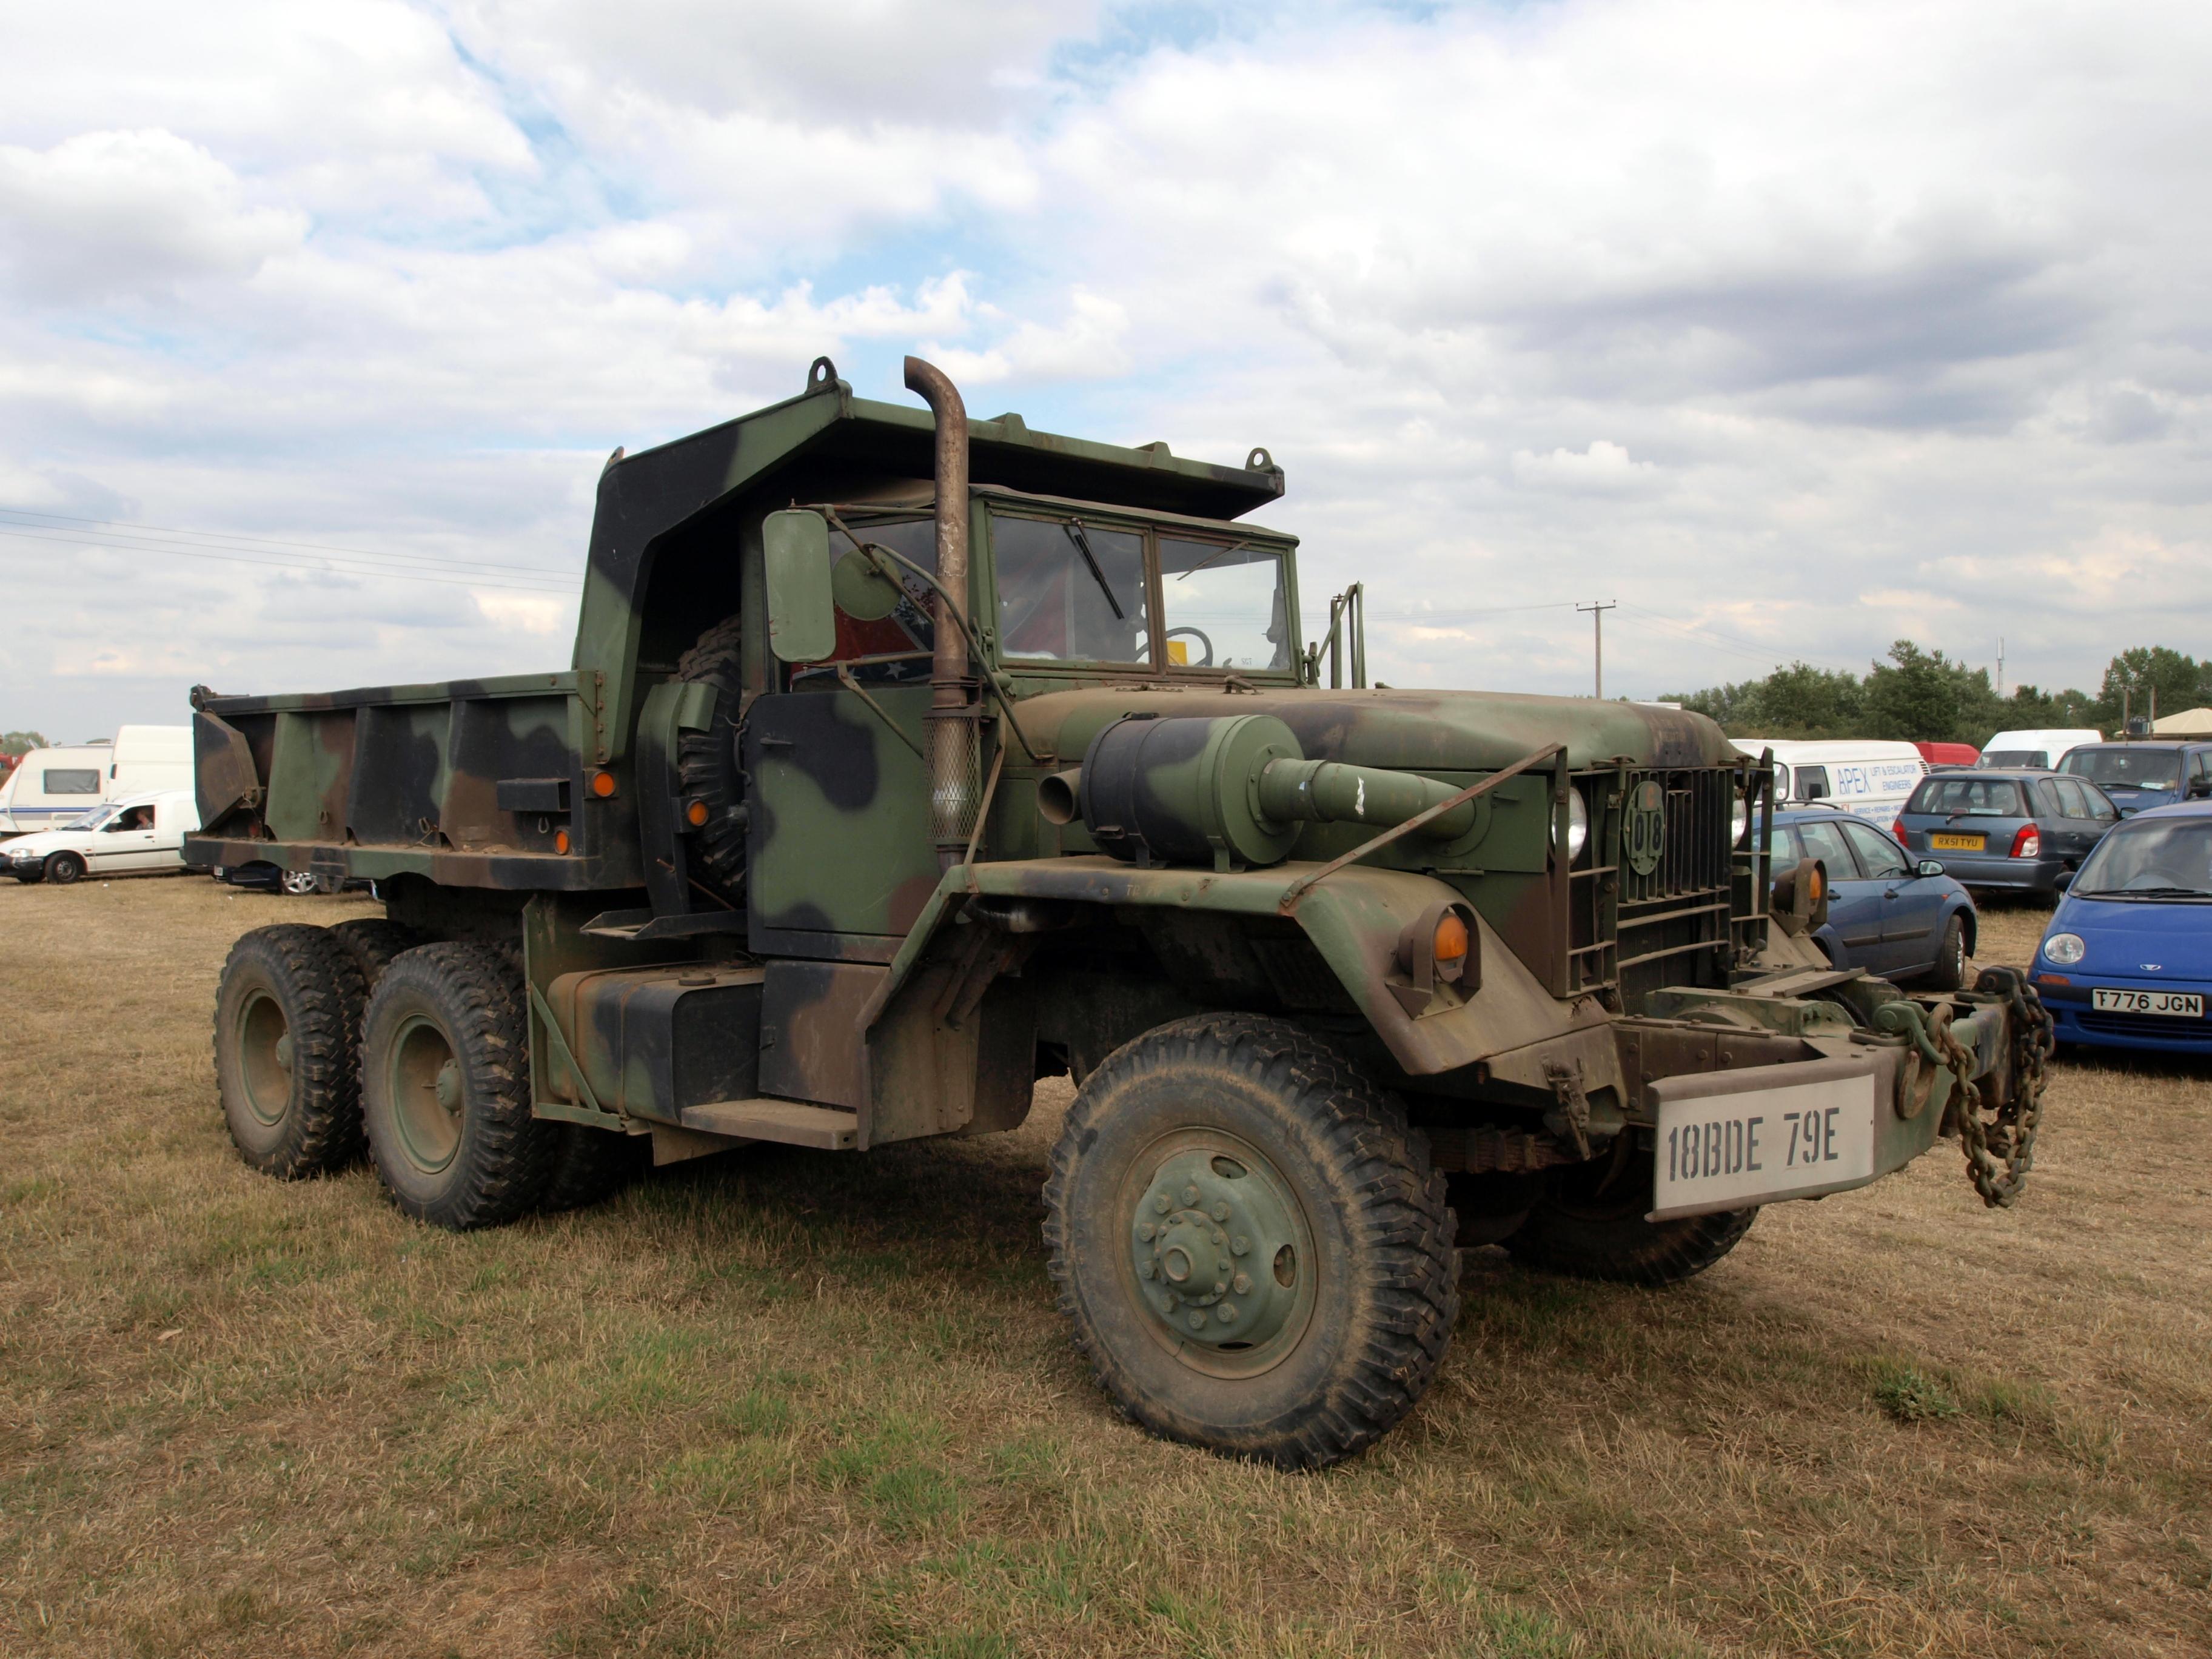 M54 5tトラック - Wikipedia